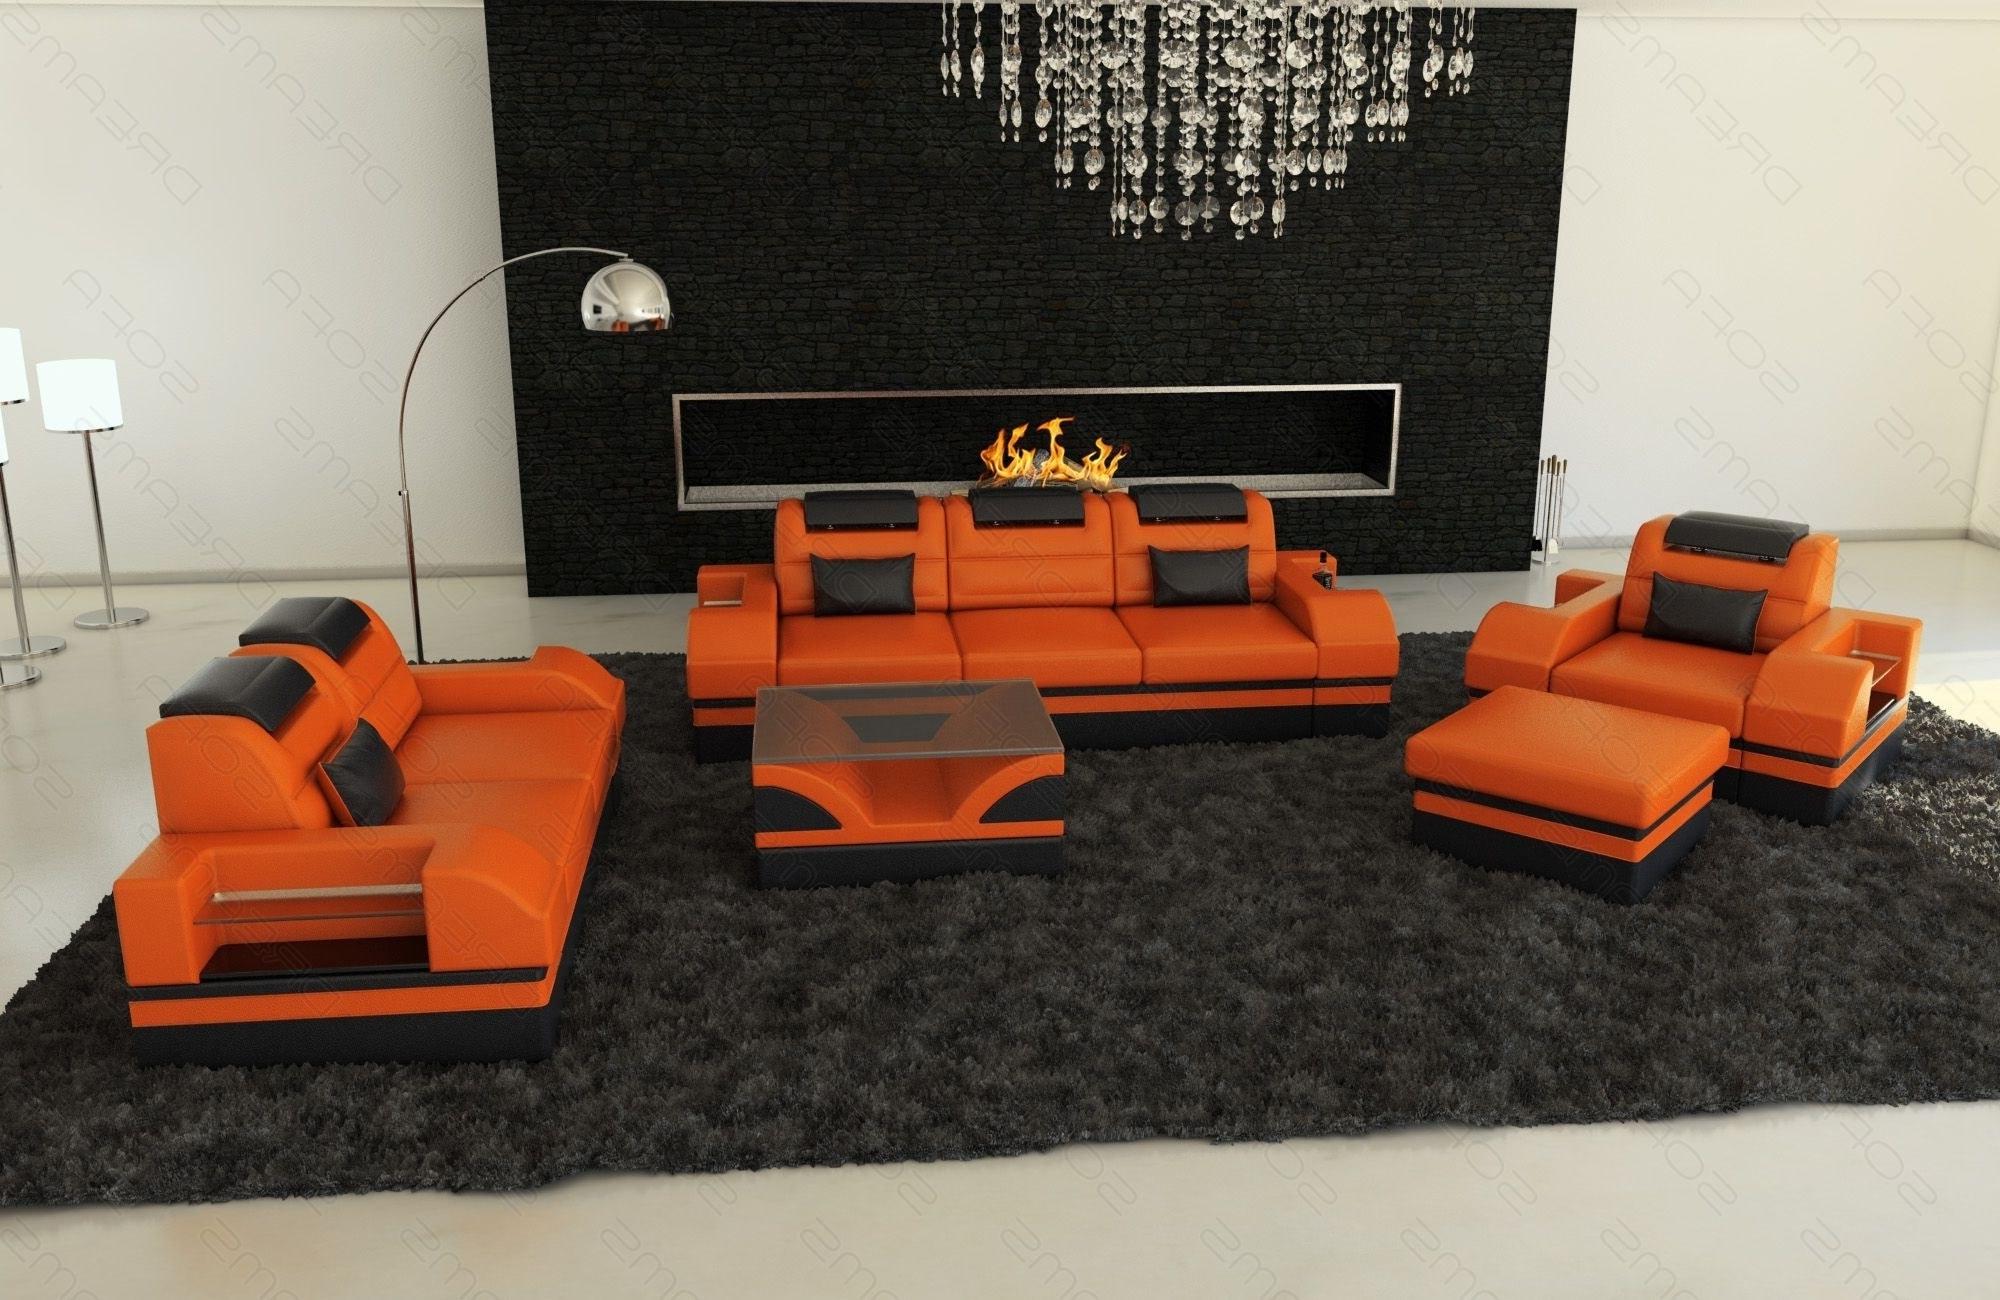 Sectional Sofa 2 3 1 San Francisco Led Within Fashionable San Francisco Sectional Sofas (View 12 of 15)